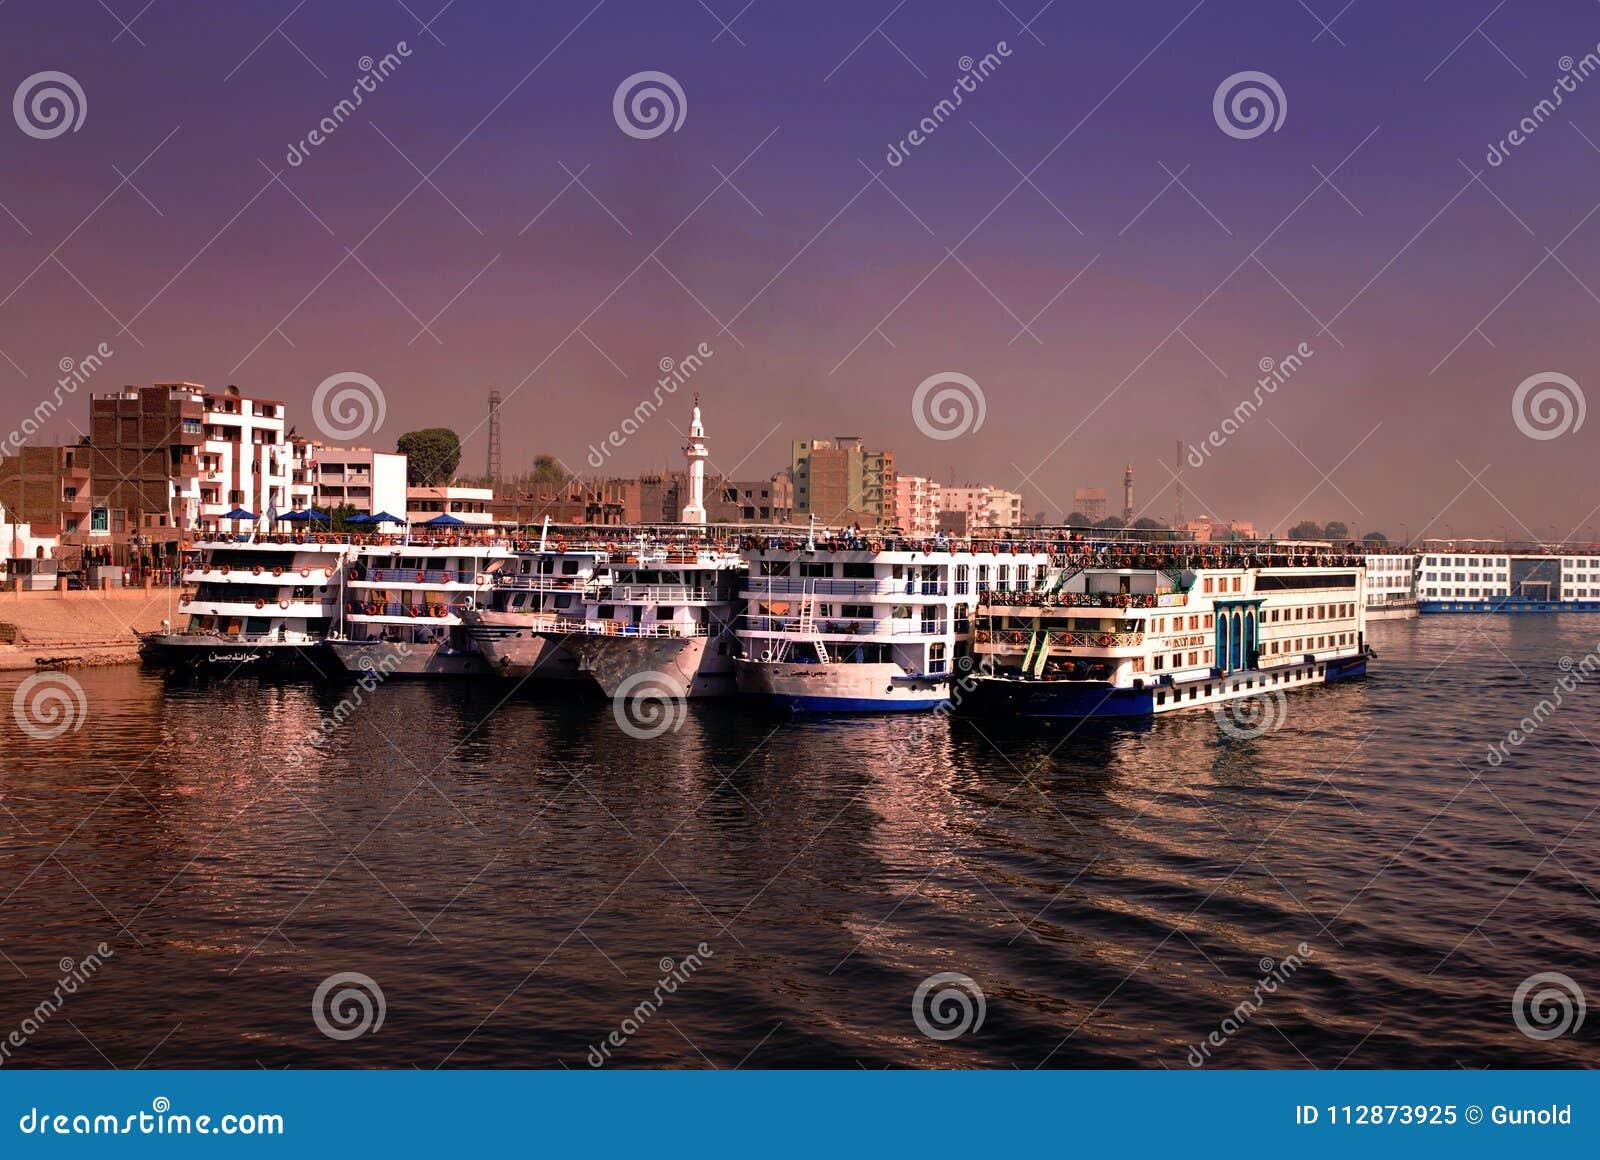 Kryssa omkring eyeliner på flodNilen som ankras på Edfu, Egypten